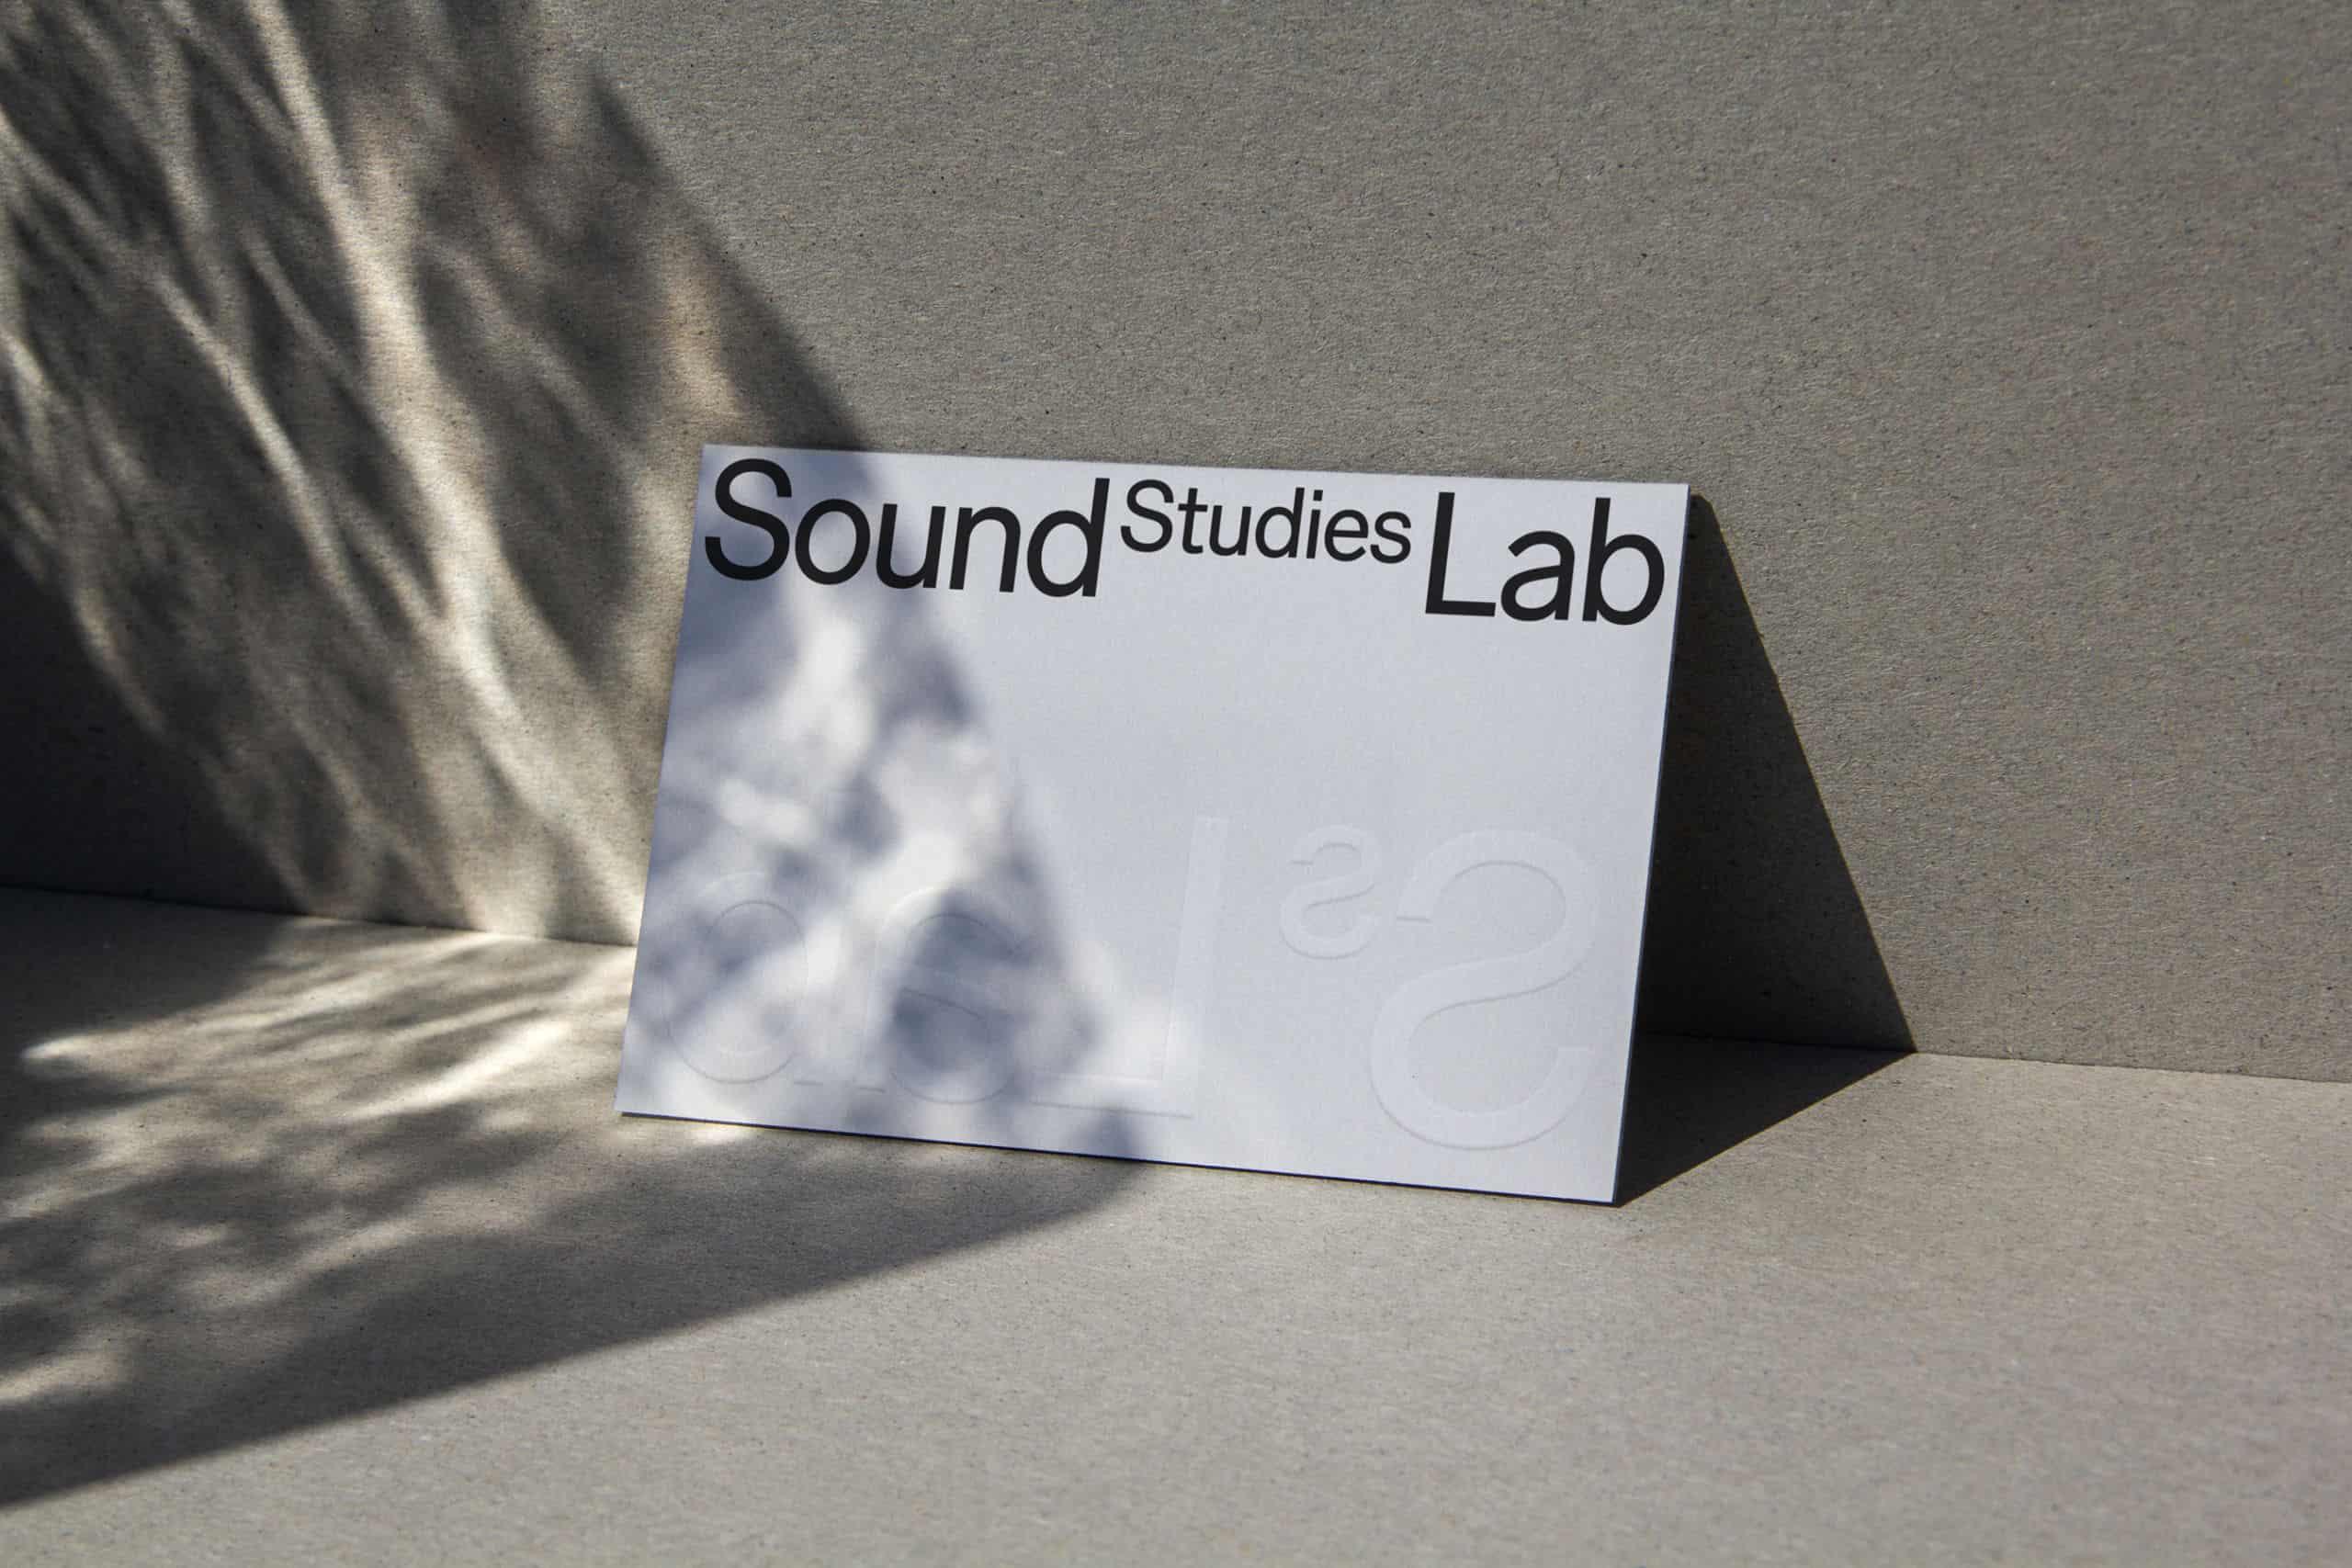 Sound Studies Lab